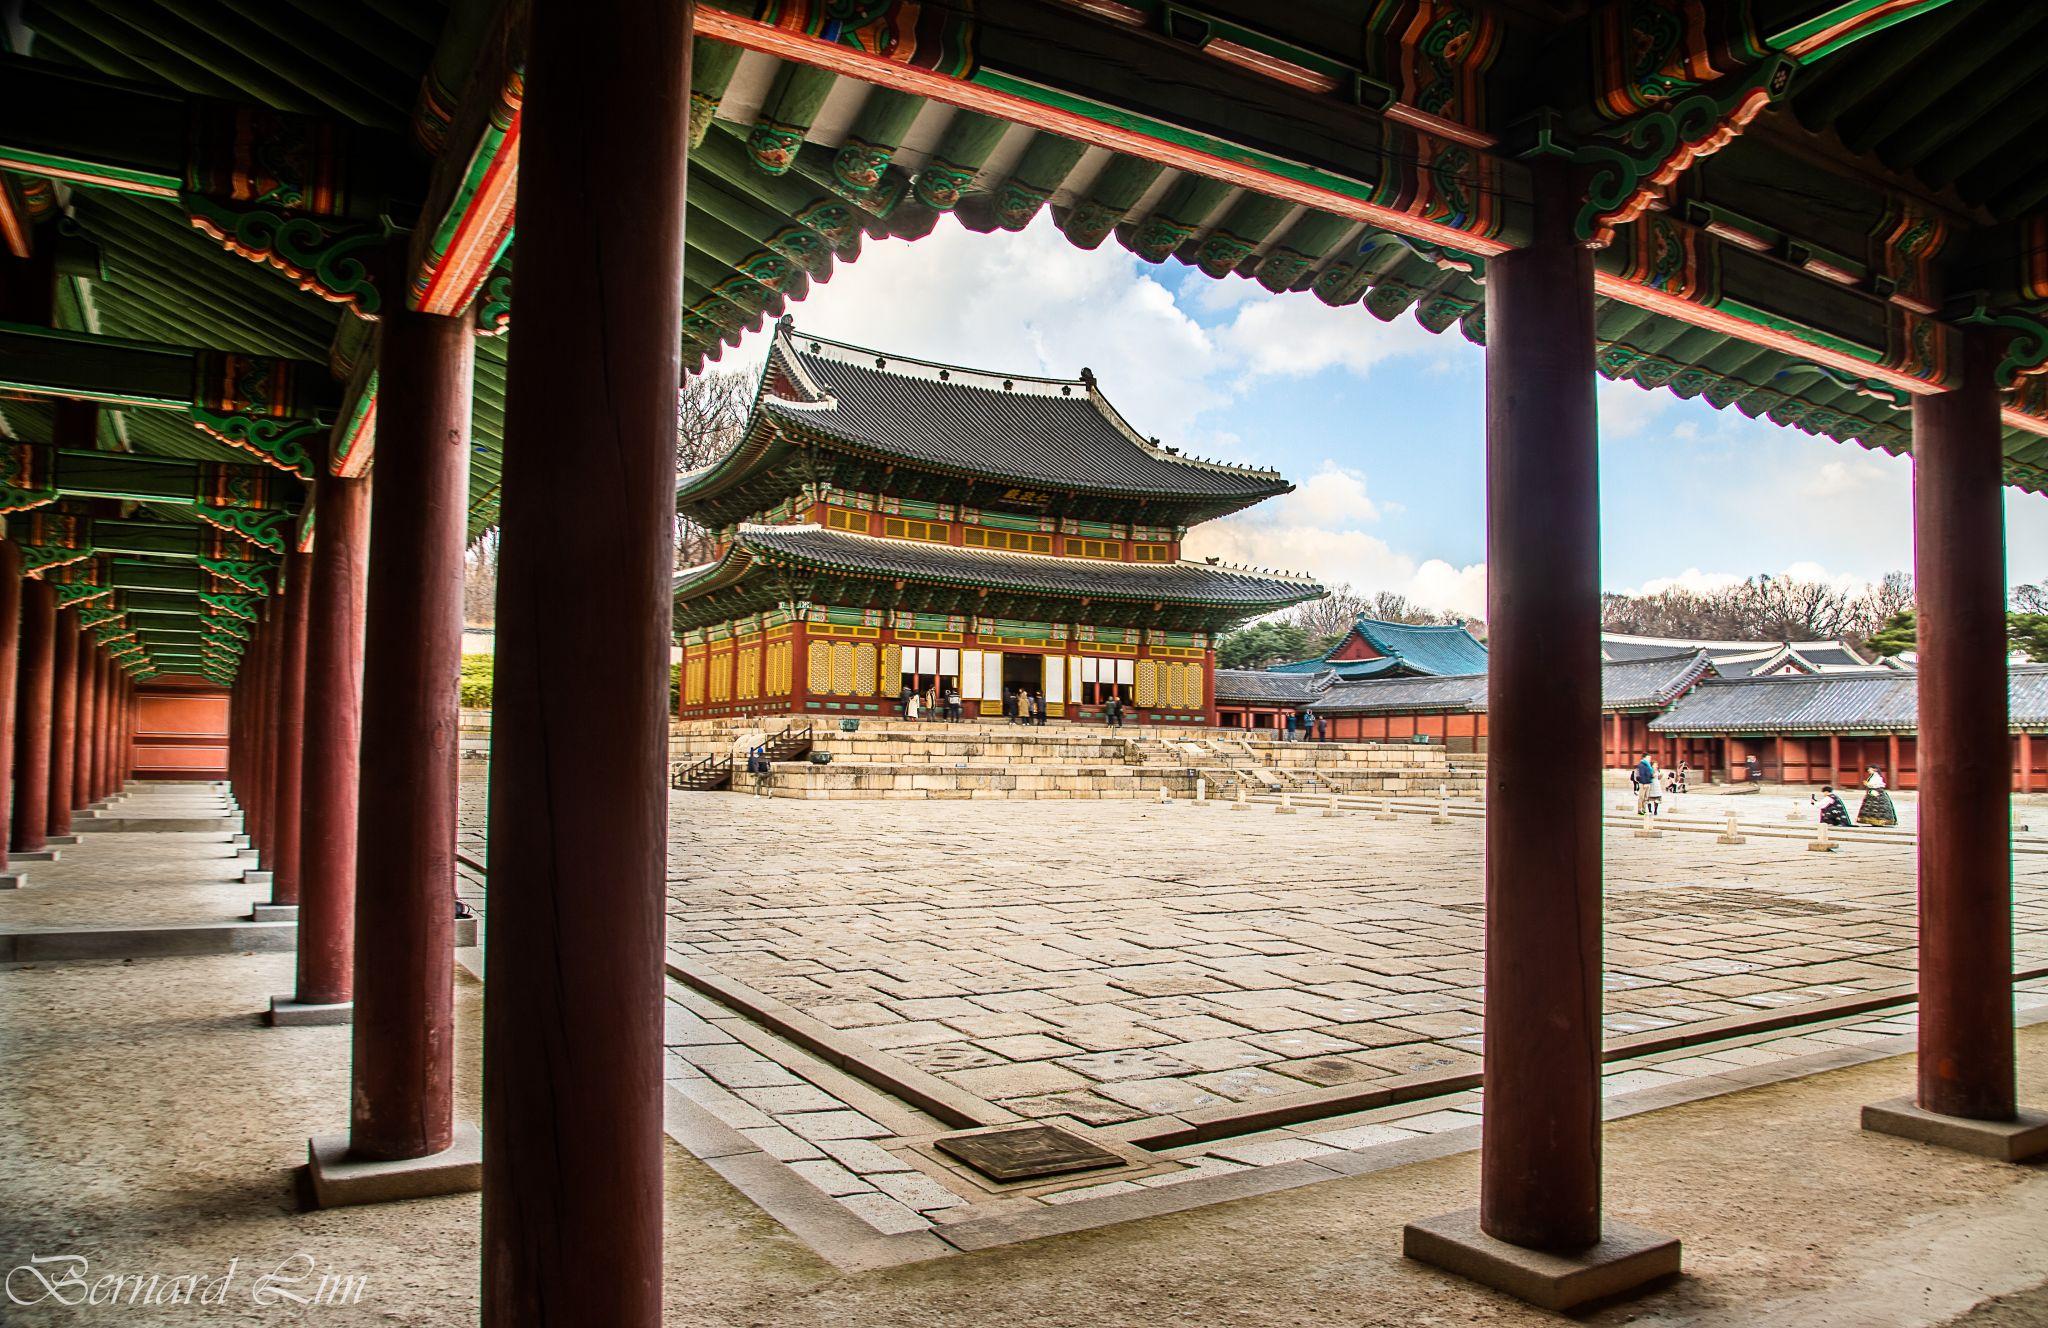 Gyeongbokgung Palace, Korea